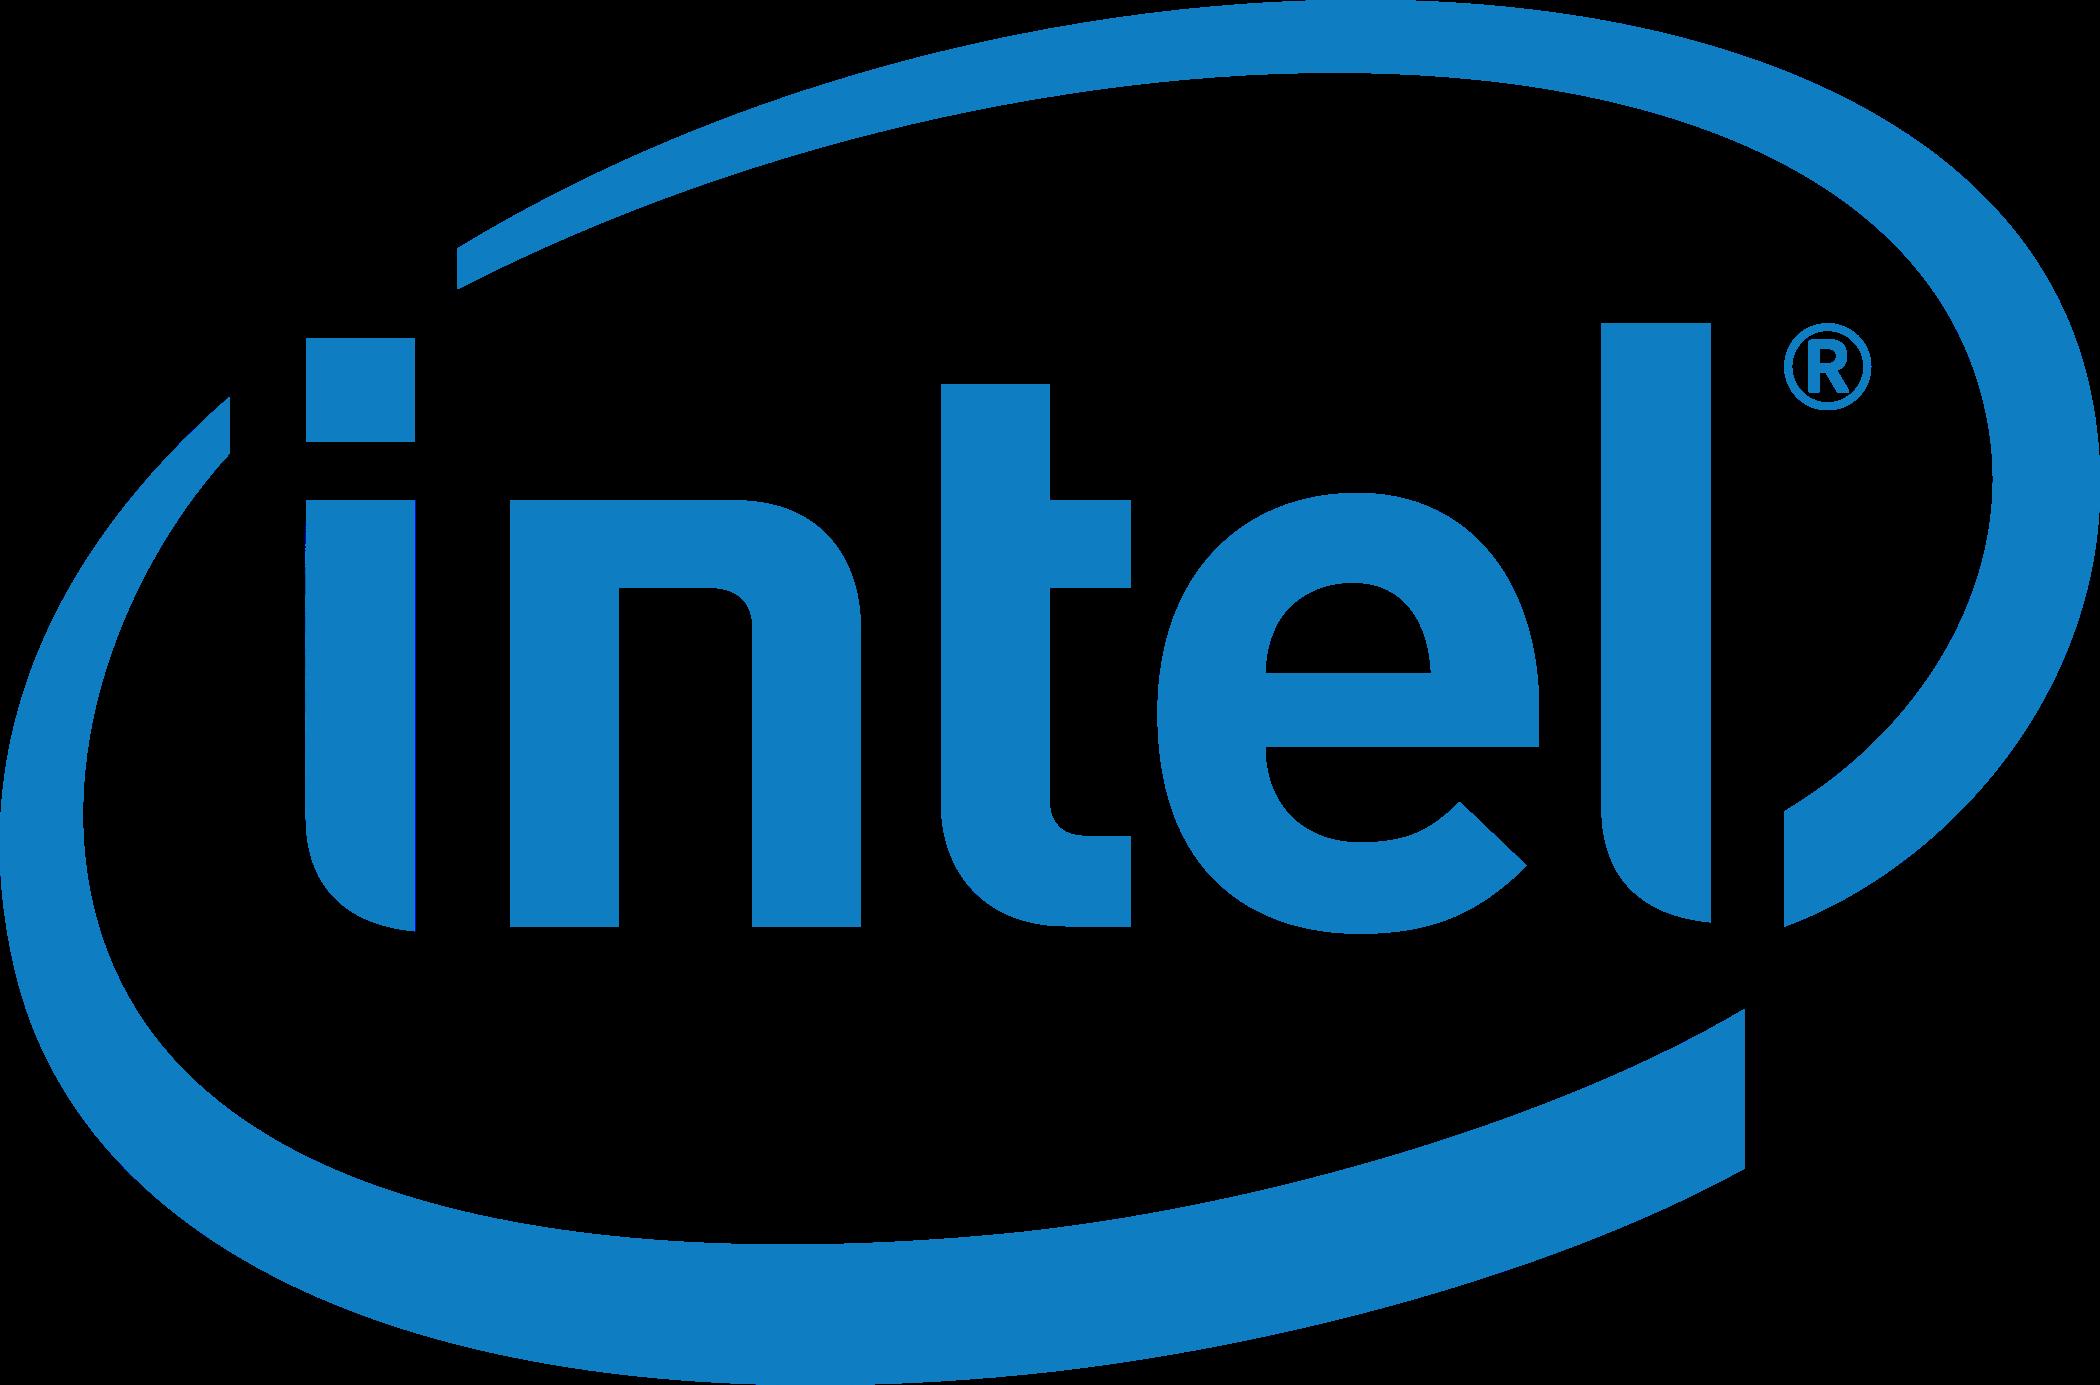 Intel-logo-1